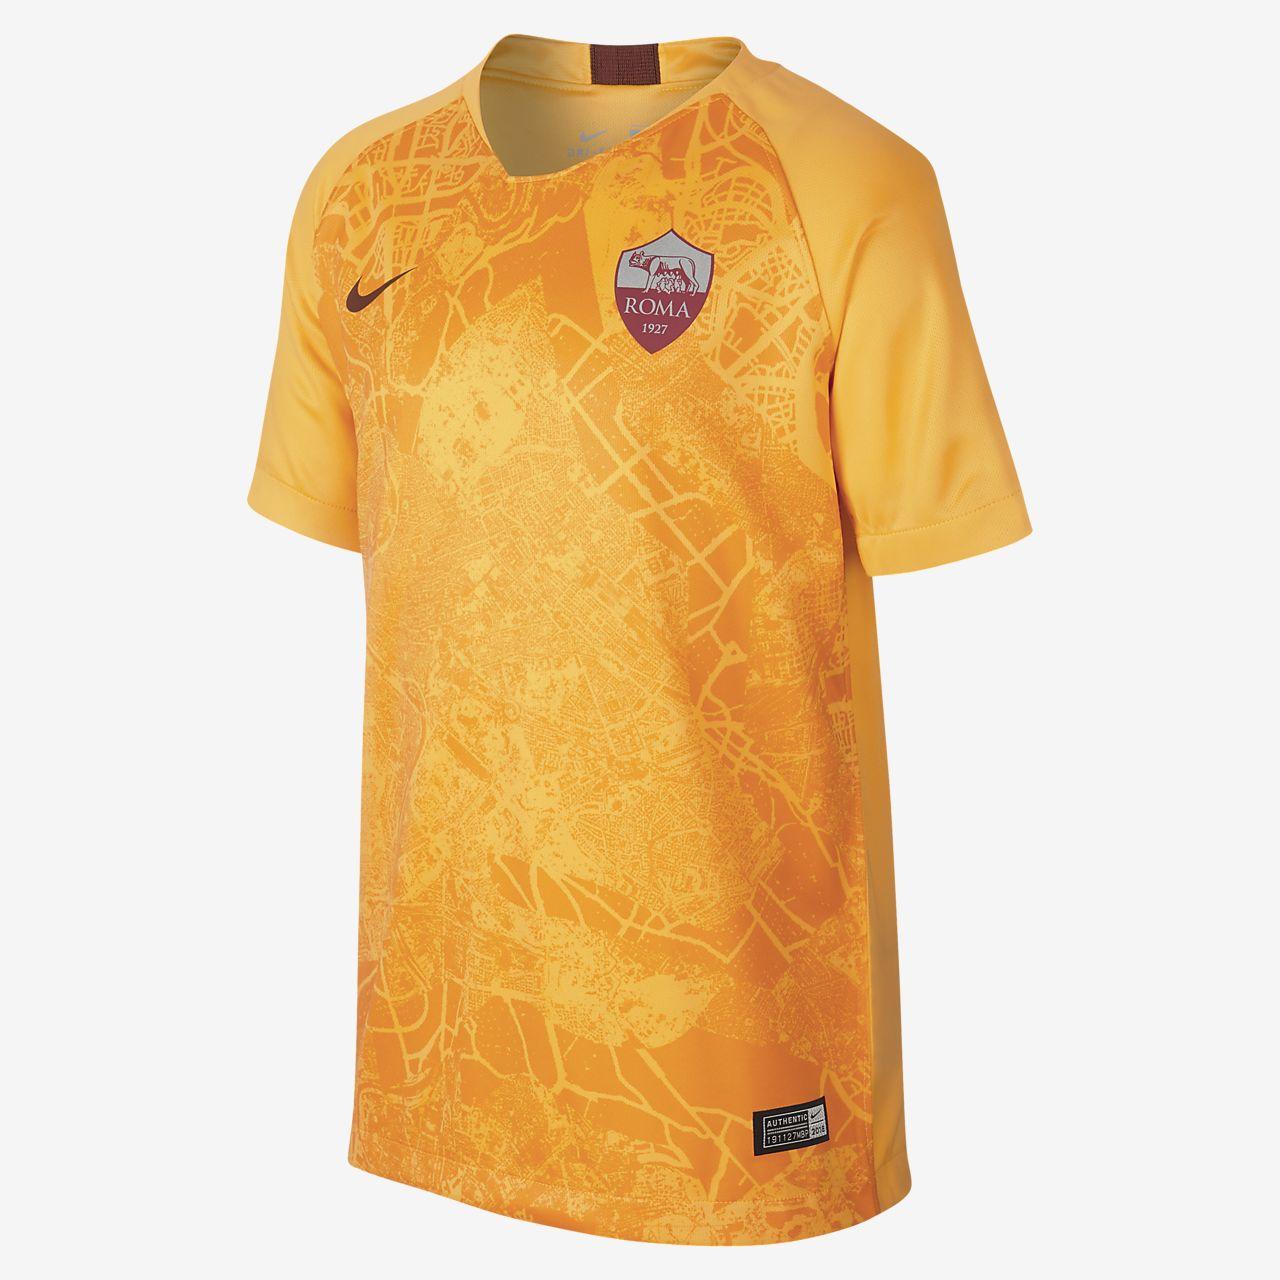 98645eb327b76 ... Camiseta de fútbol para niños talla grande alternativa A.S. Roma  Stadium